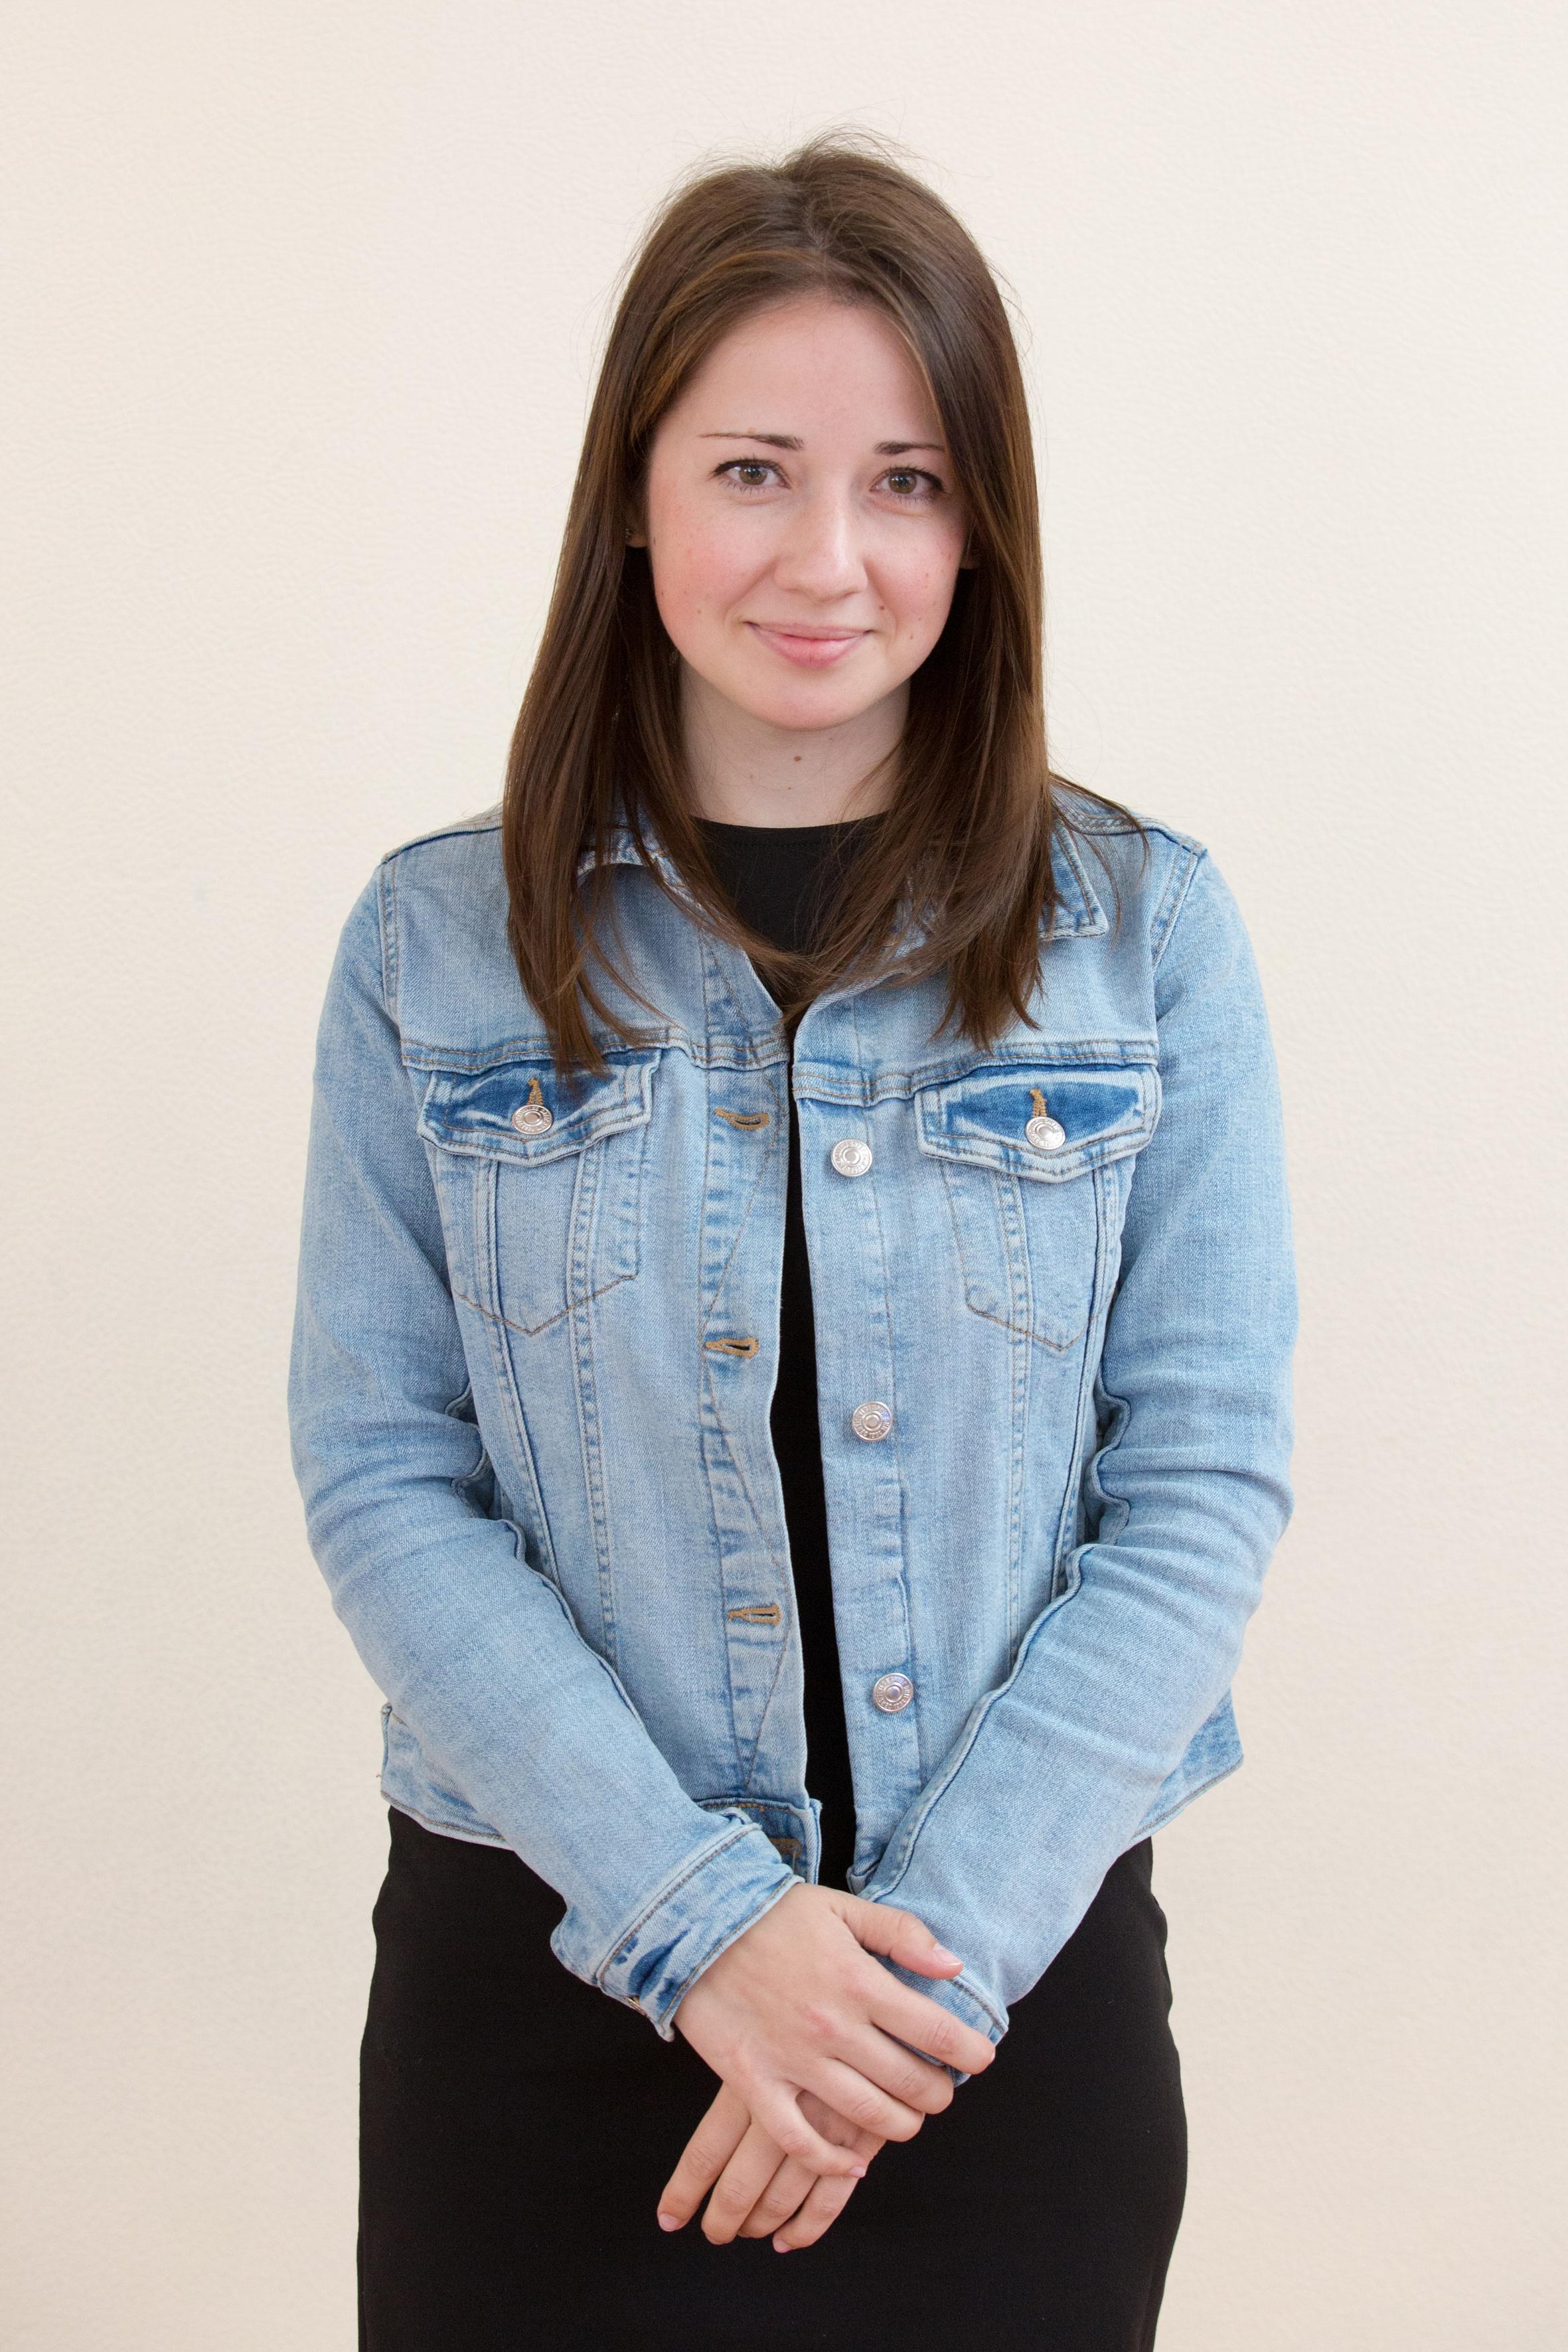 Olga Kochkina